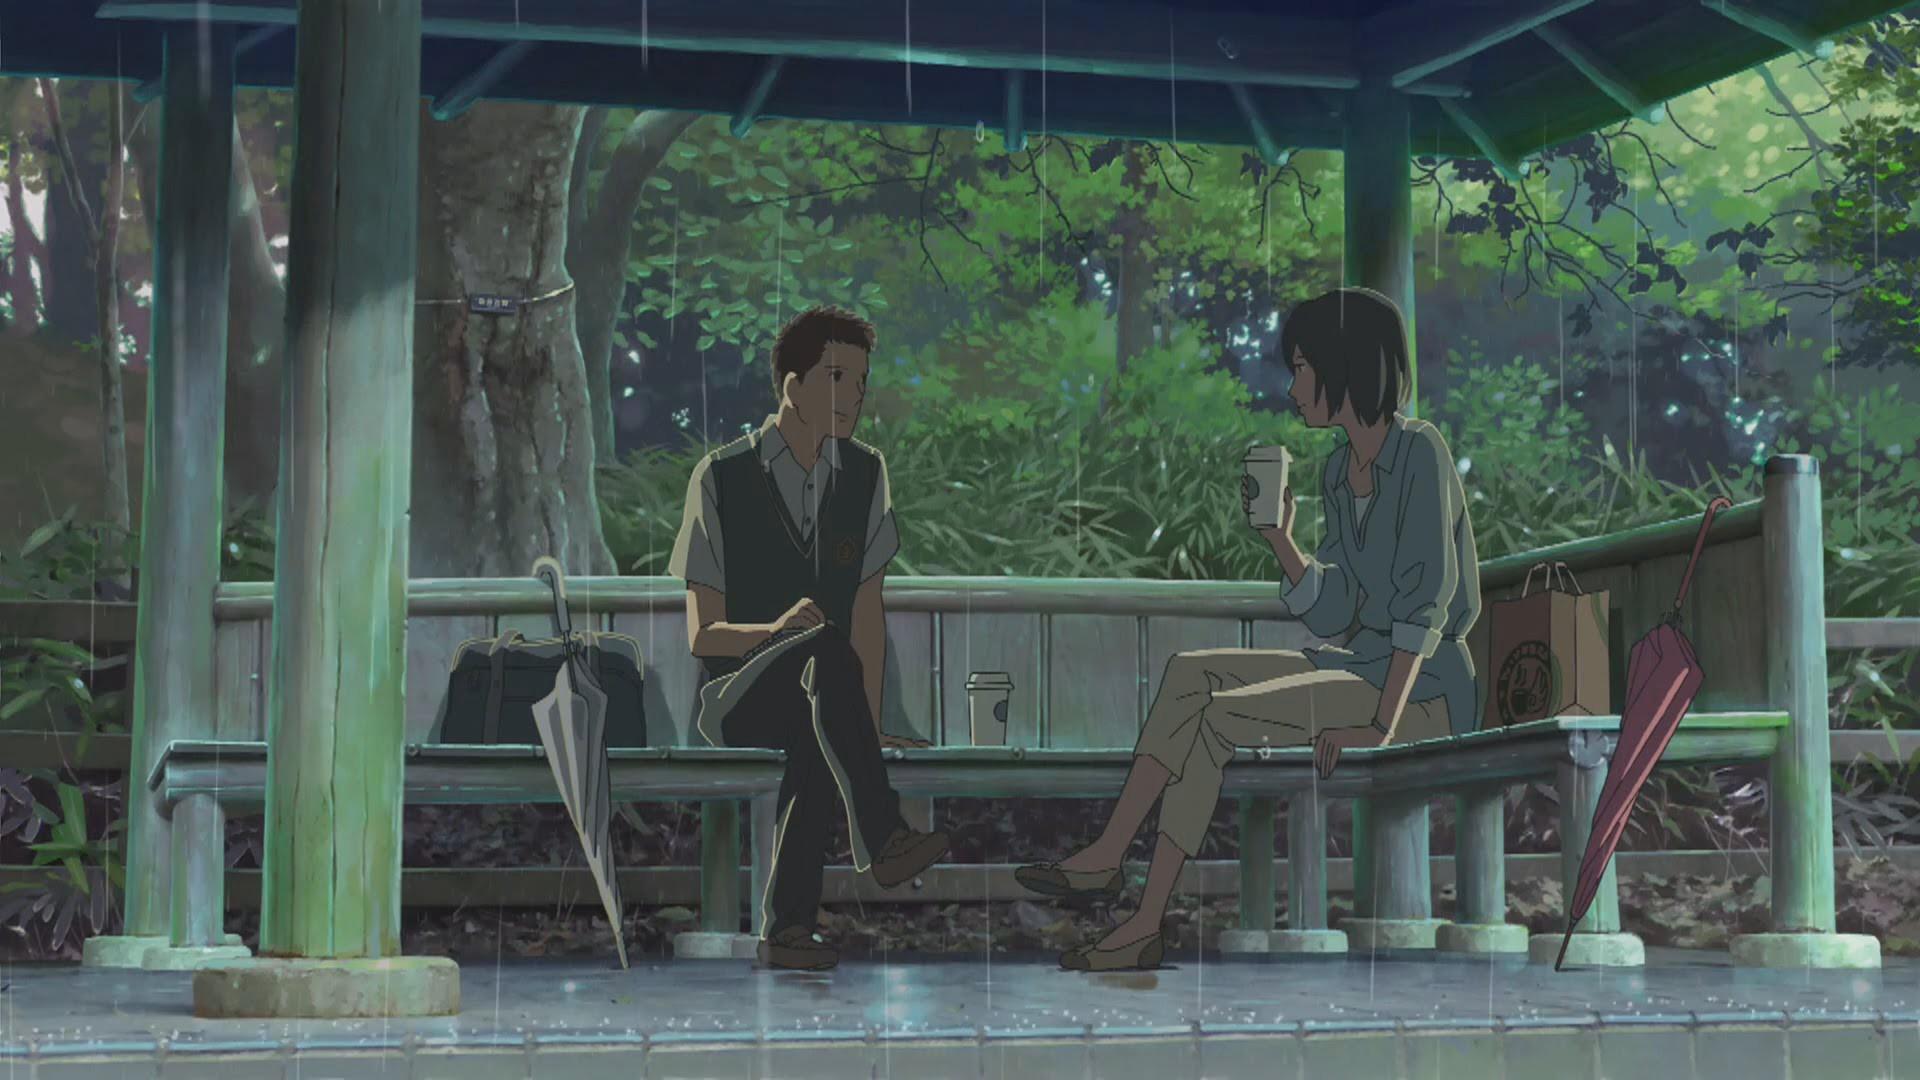 Makoto Shinkai film like Higehiro, The Garden of Words